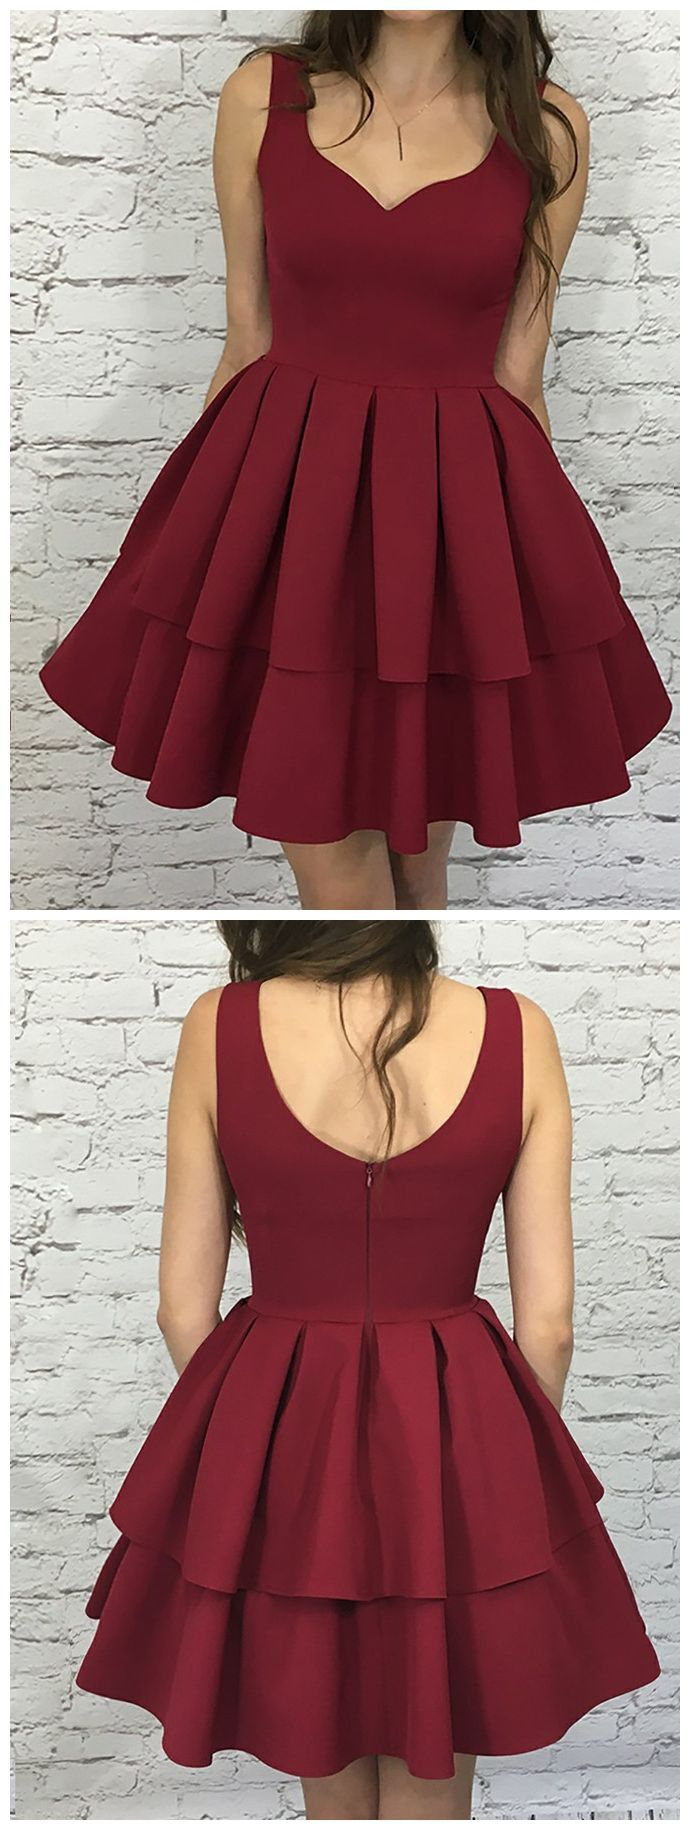 simple burgundy party dresses,tiered short homecoming dress,zipper back prom dresses,satin dress for teens #shortpromdresses